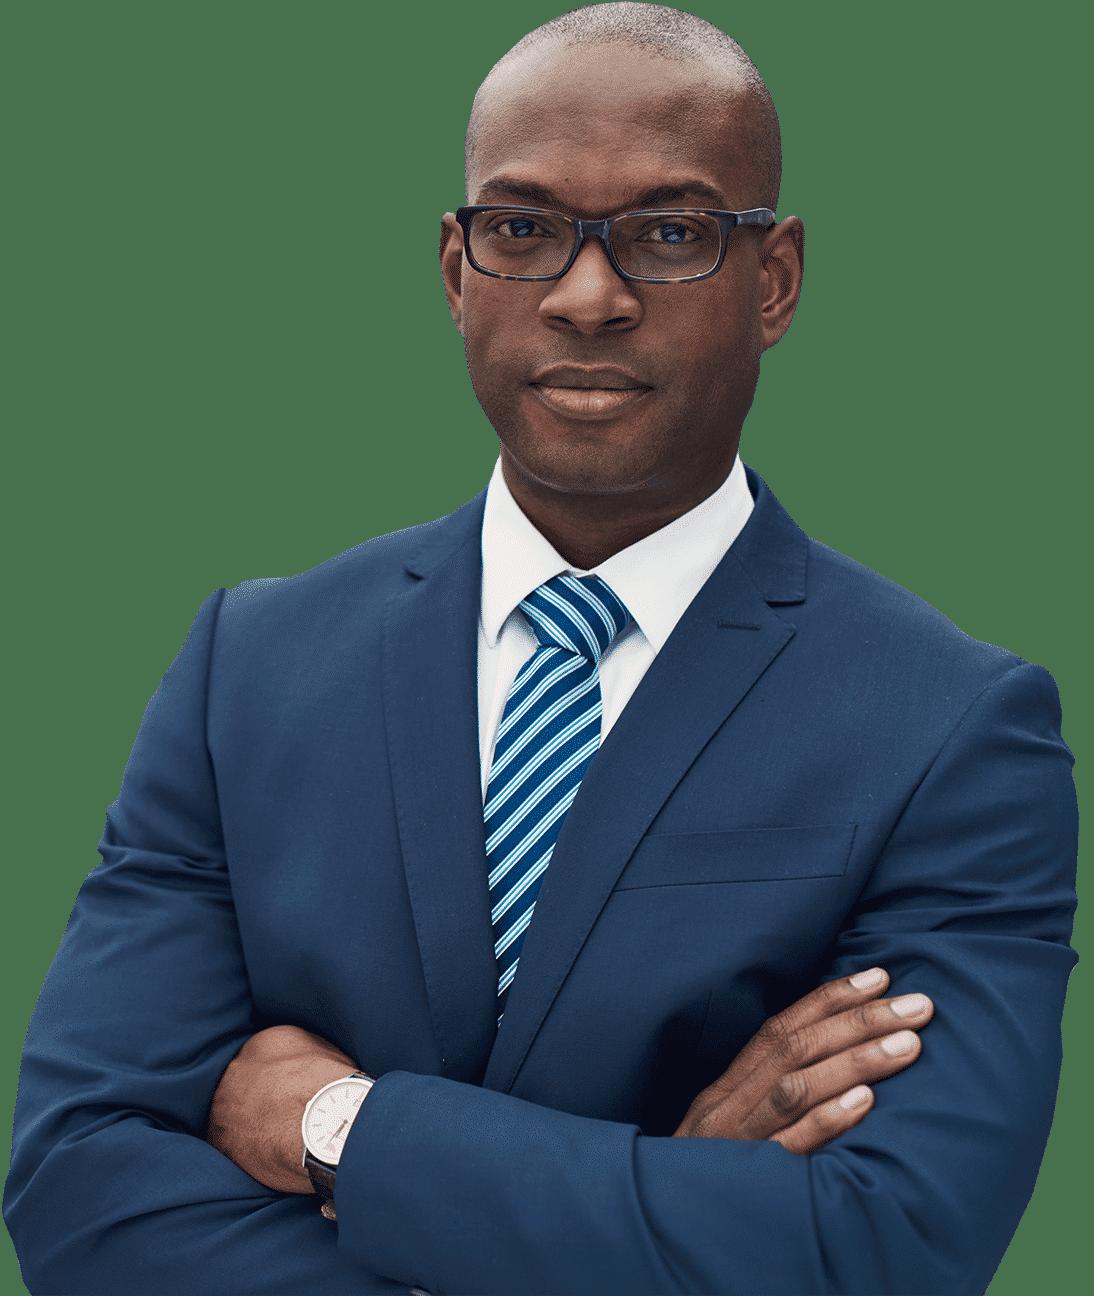 Politic WordPress Theme - Candidate